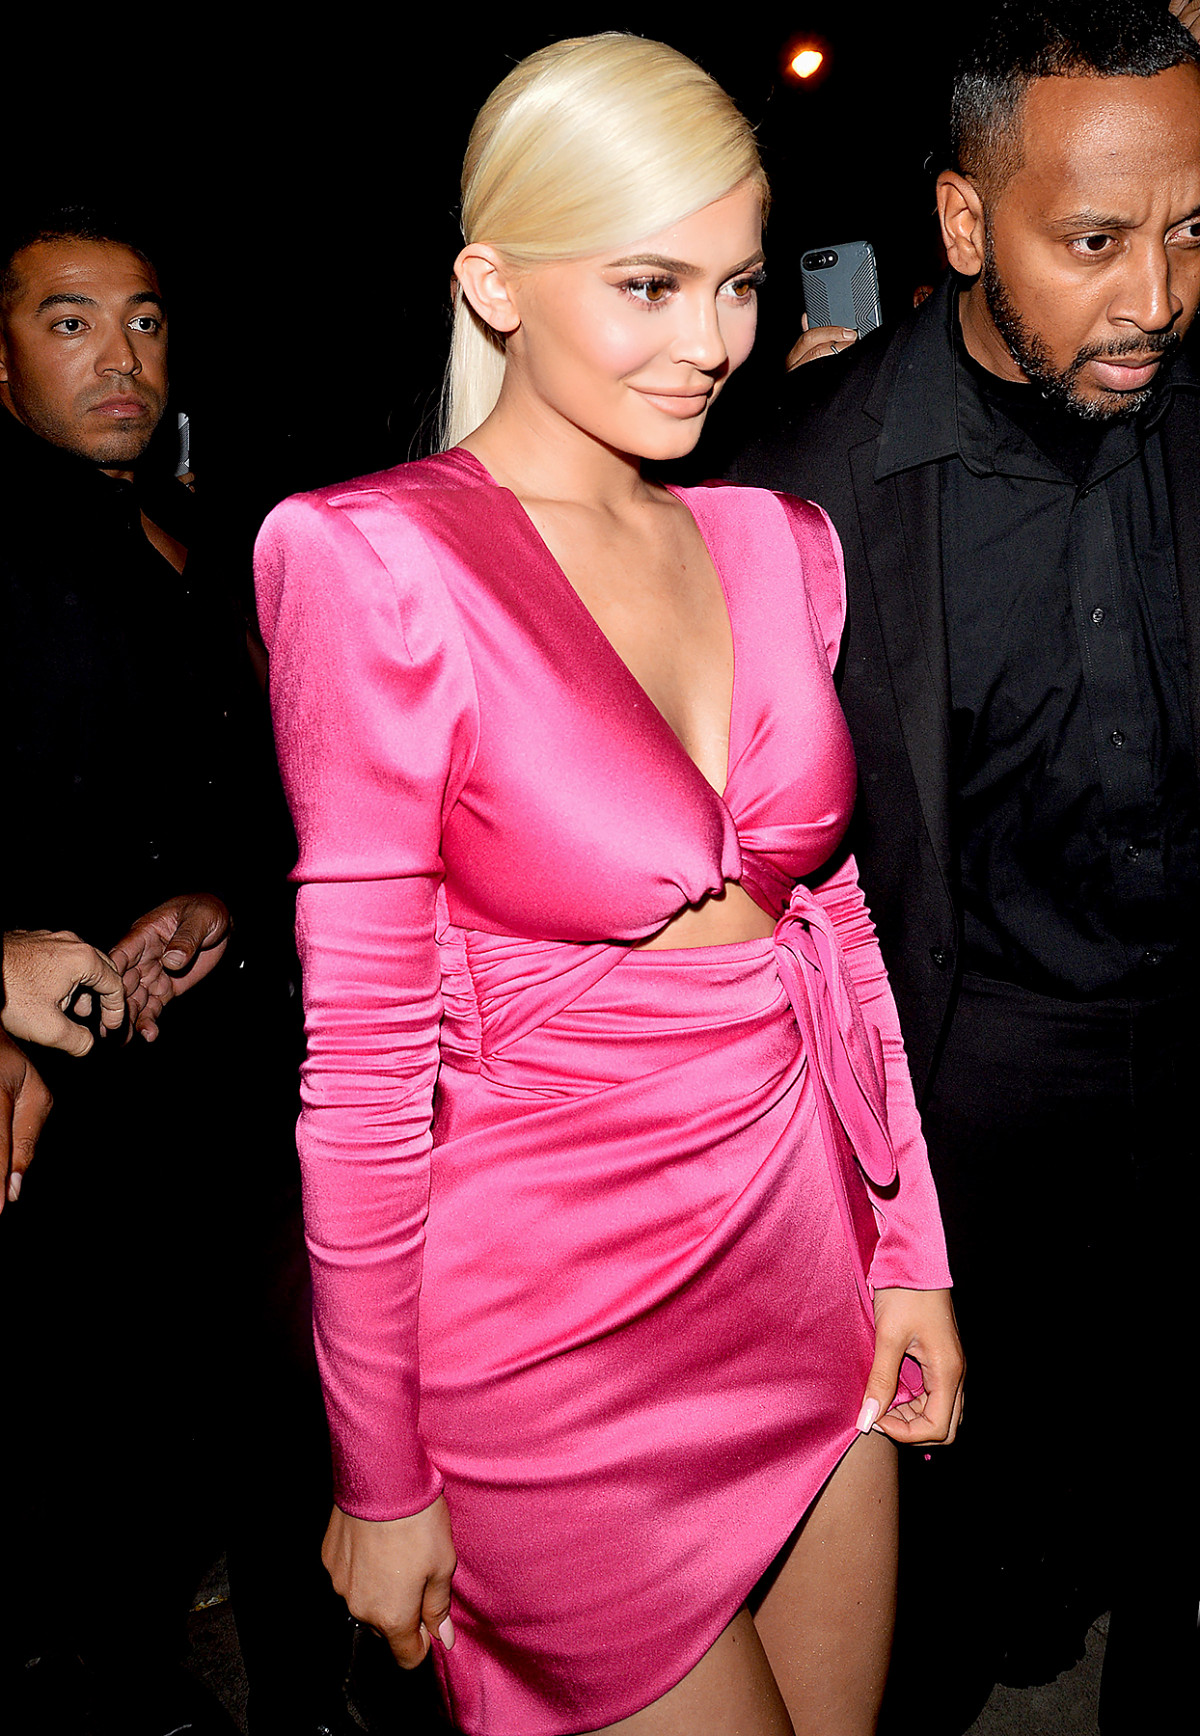 Los looks de las Kardashian en la rosada fiesta de Kylie Jenner ...